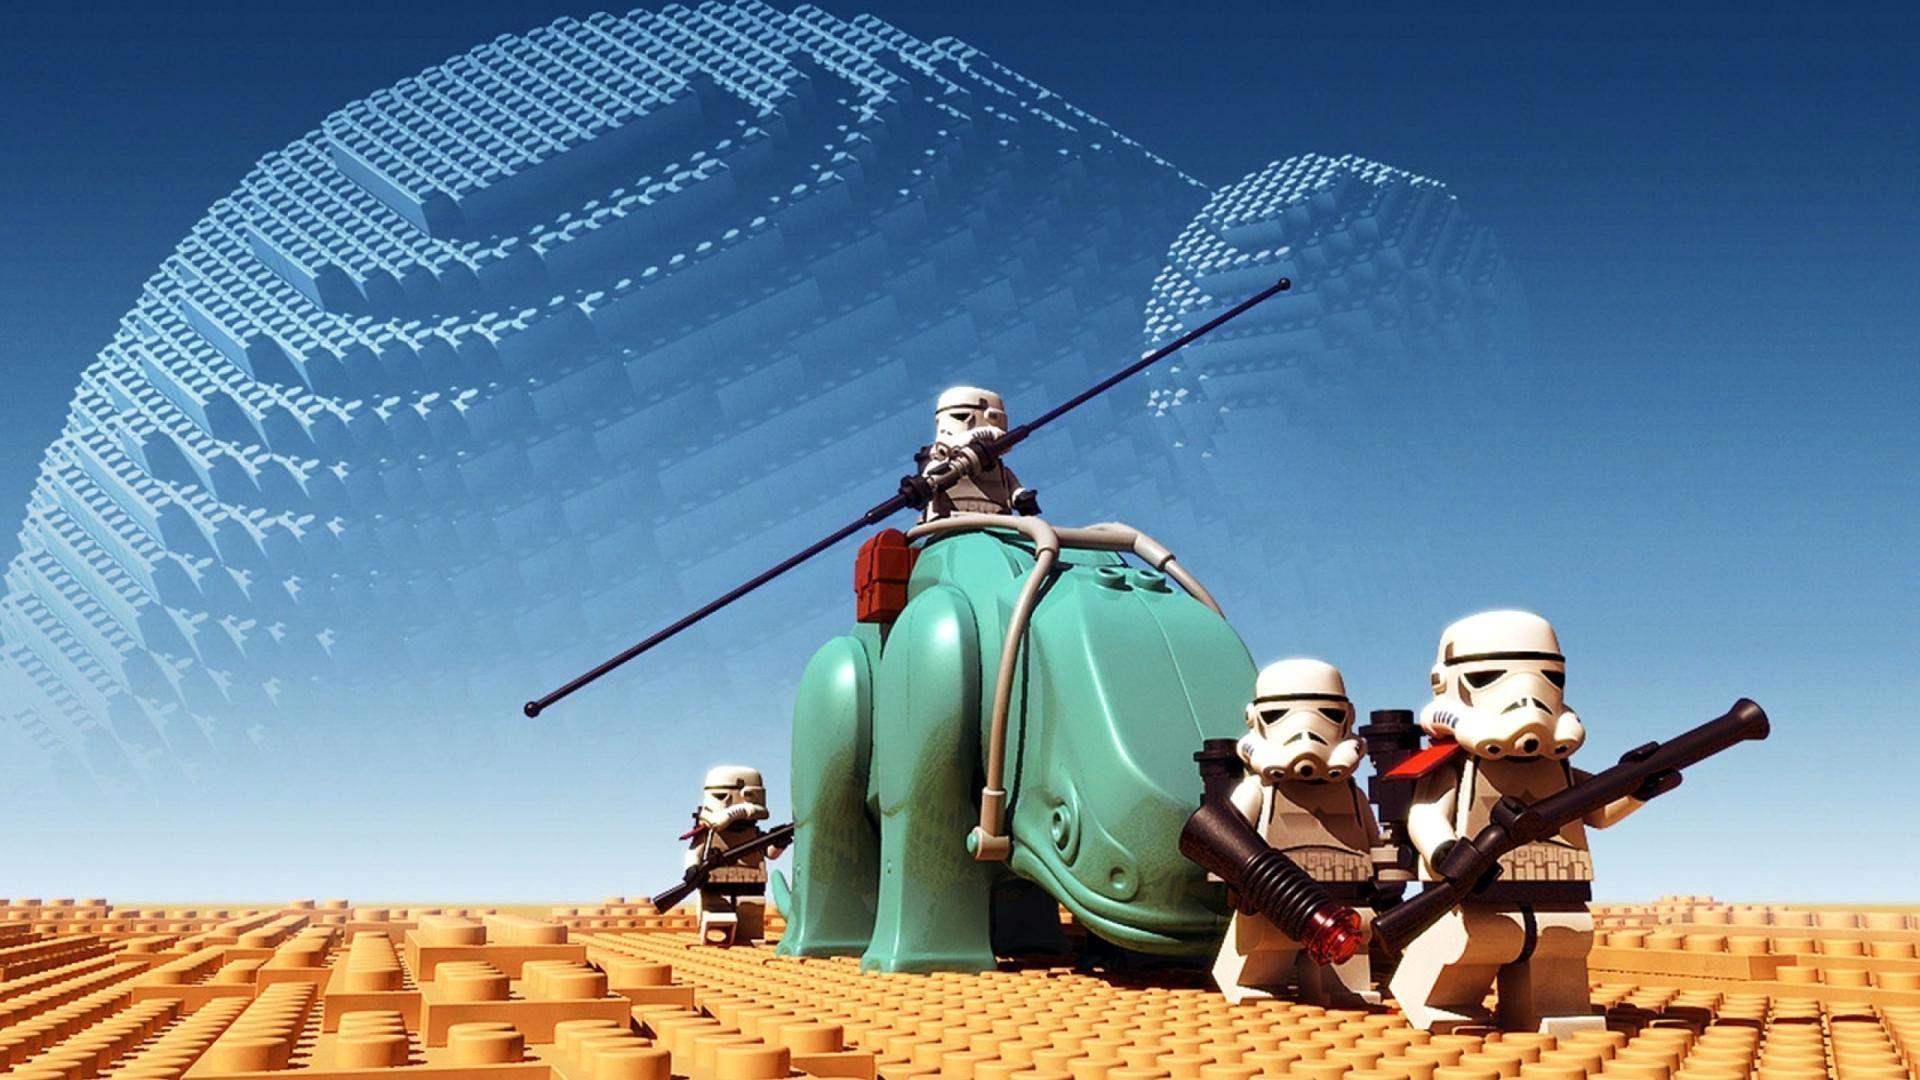 Elegant Funny Star Wars Droids Wallpaper Star Wars Wallpaper Star Wars Humor Star Wars Droids